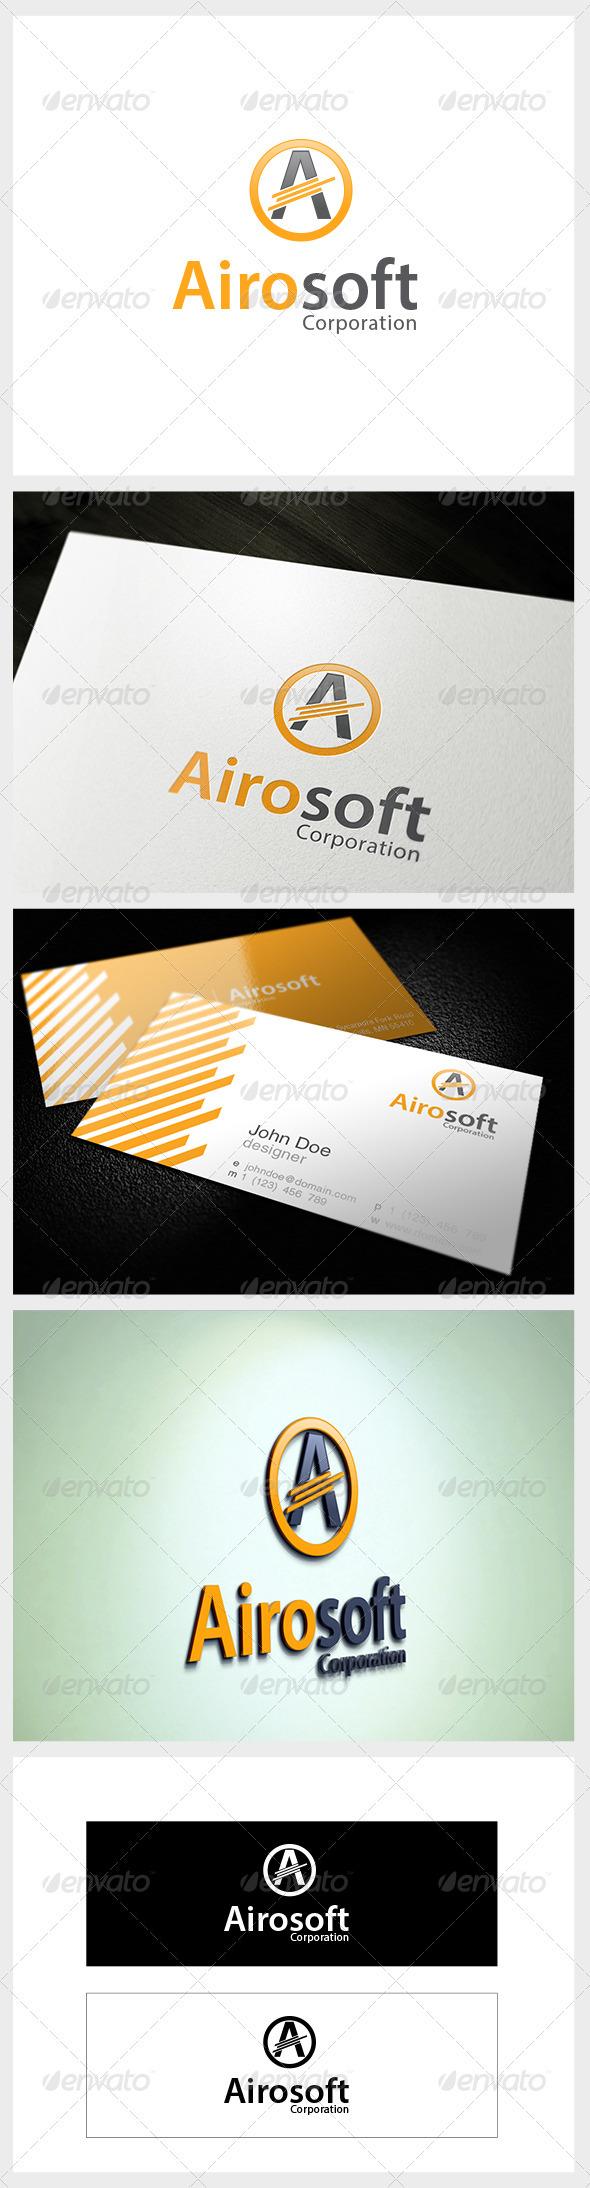 Airosoft Corporation logo - Letters Logo Templates